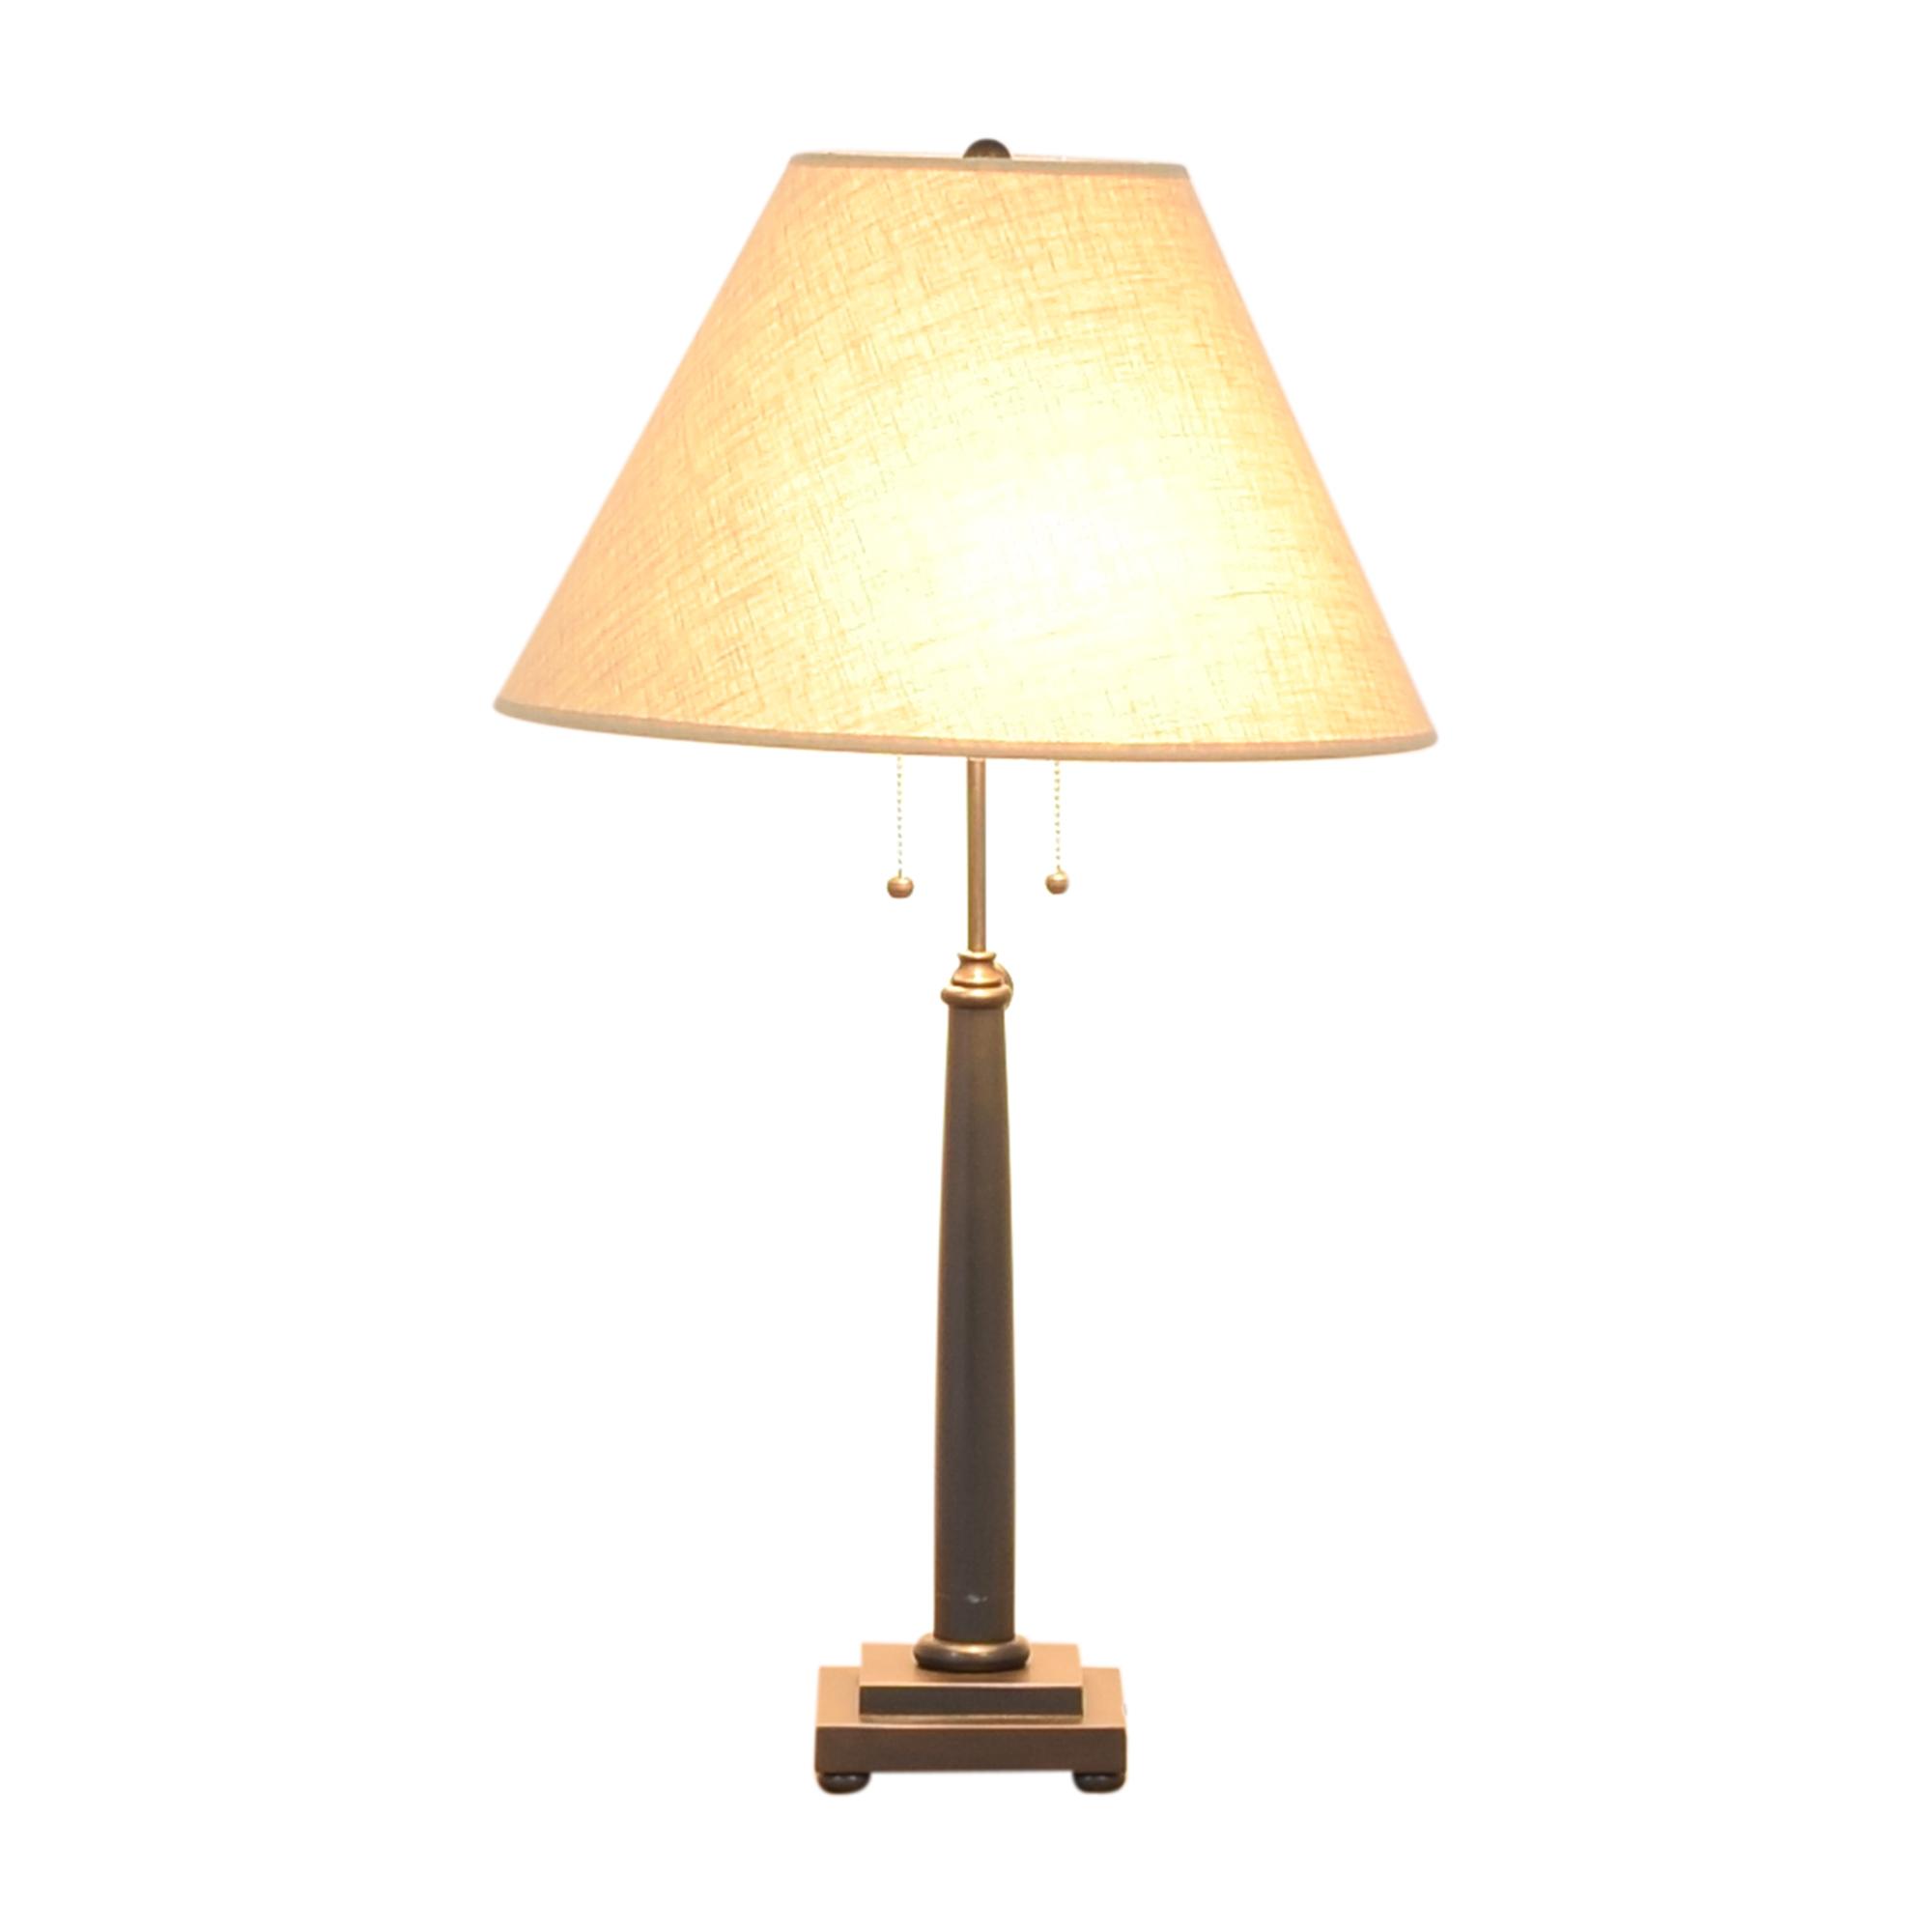 Pottery Barn Pottery Barn Adjustable Table Lamp used